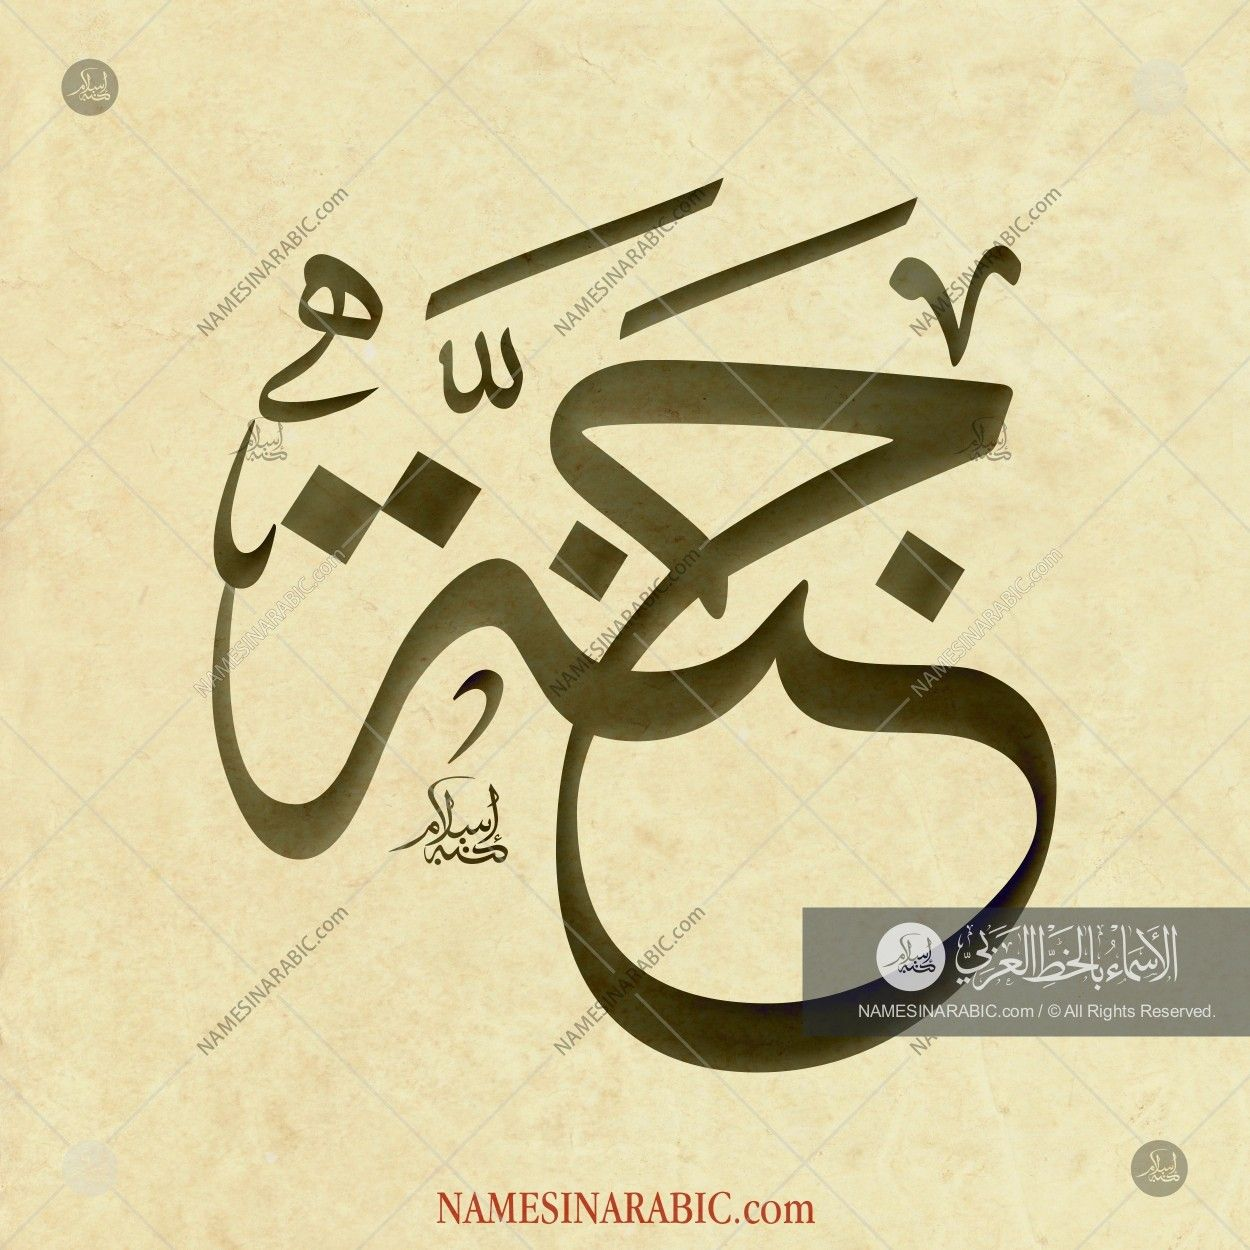 Jannah جنة Names In Arabic Calligraphy Name 3769 Calligraphy Name Calligraphy Caligraphy Art